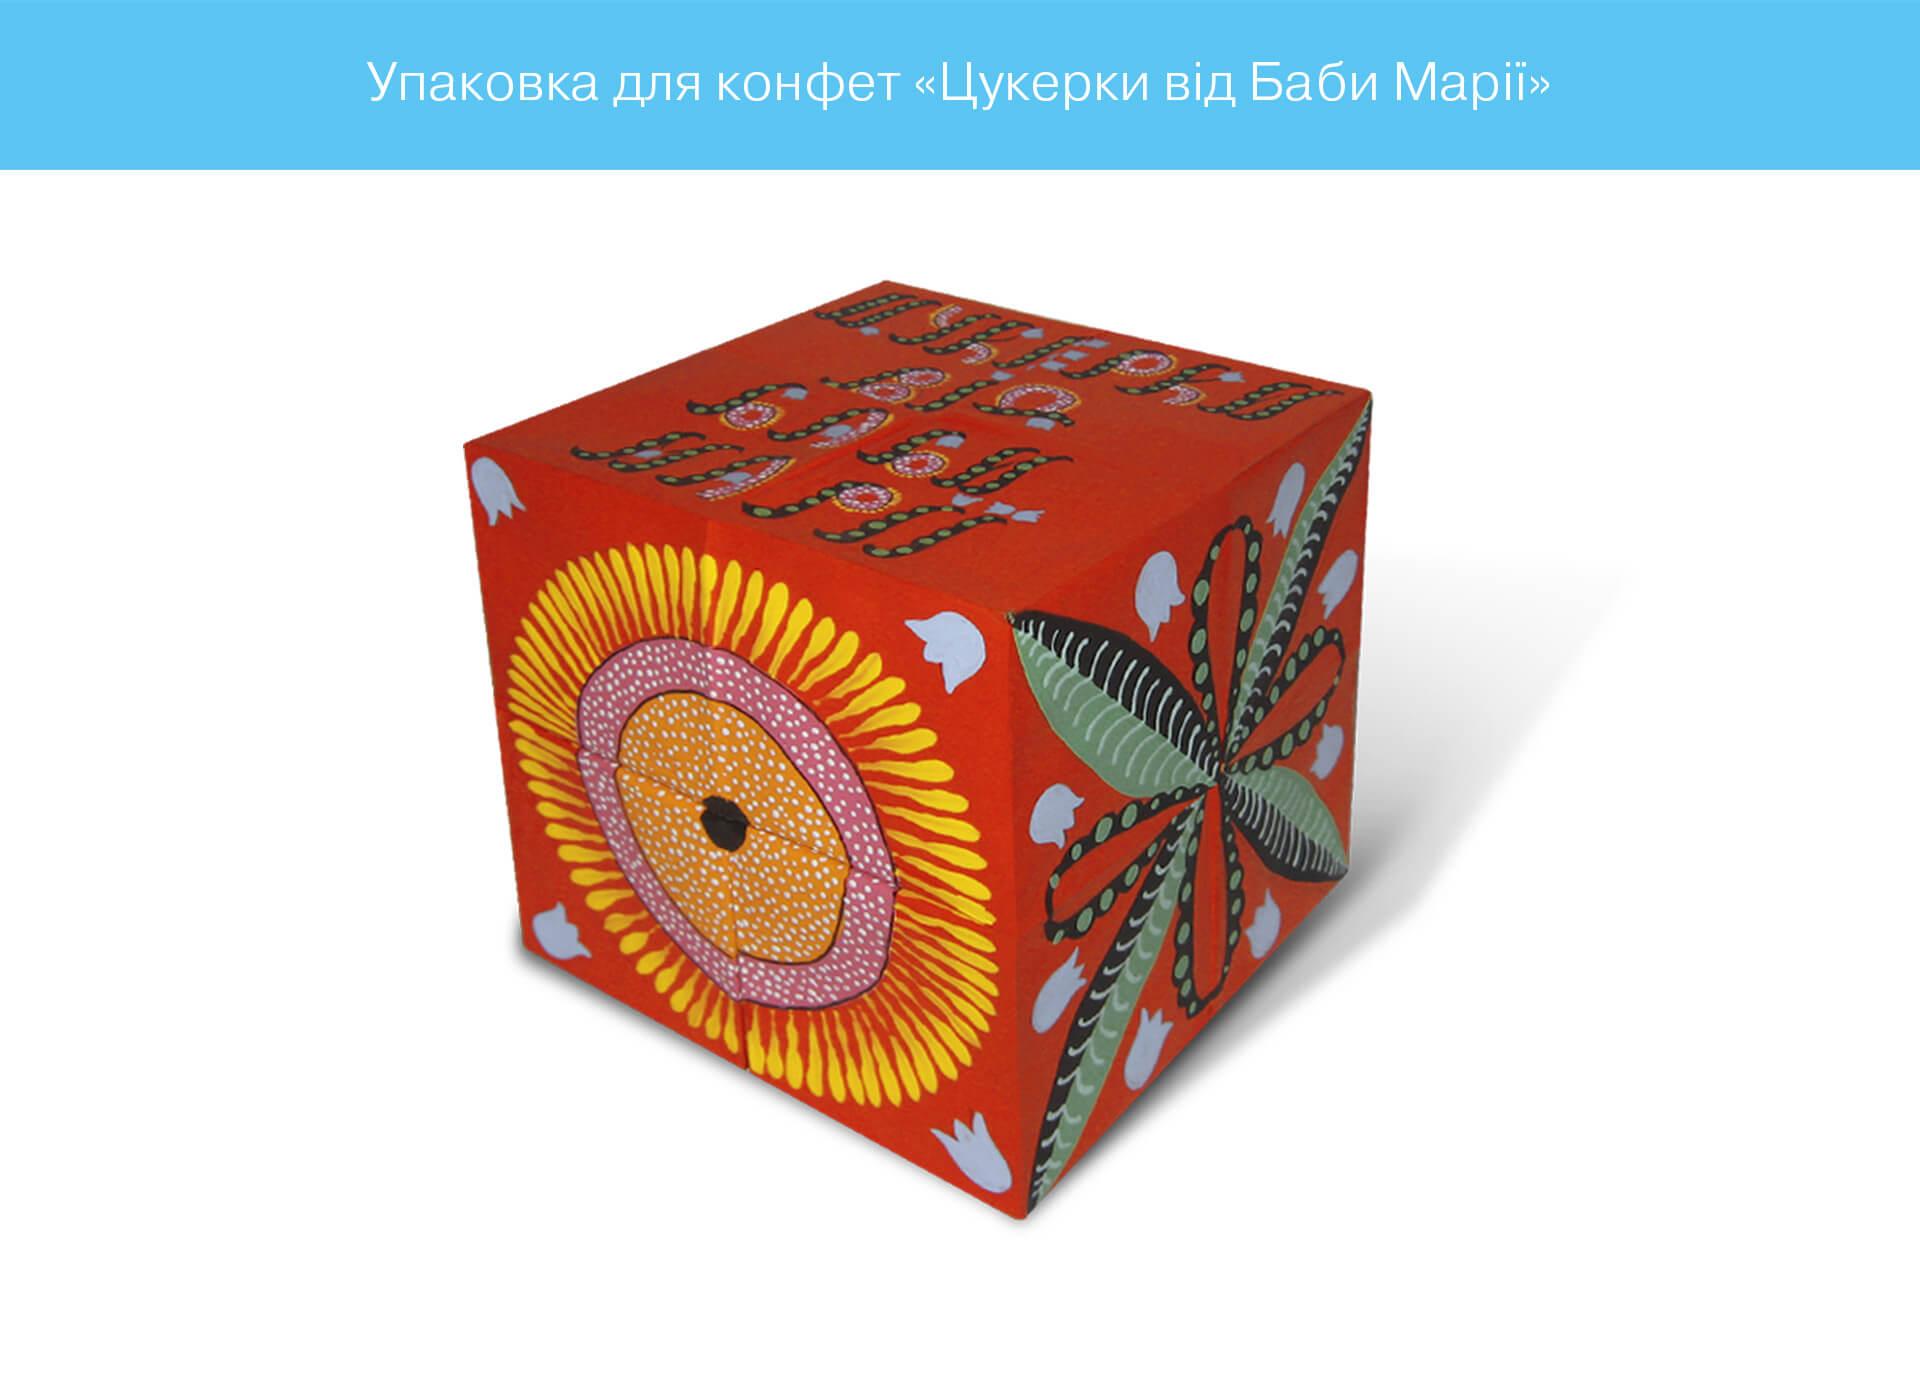 prokochuk_irina_packing-tsukerki-od-babi-mari%d1%97_4